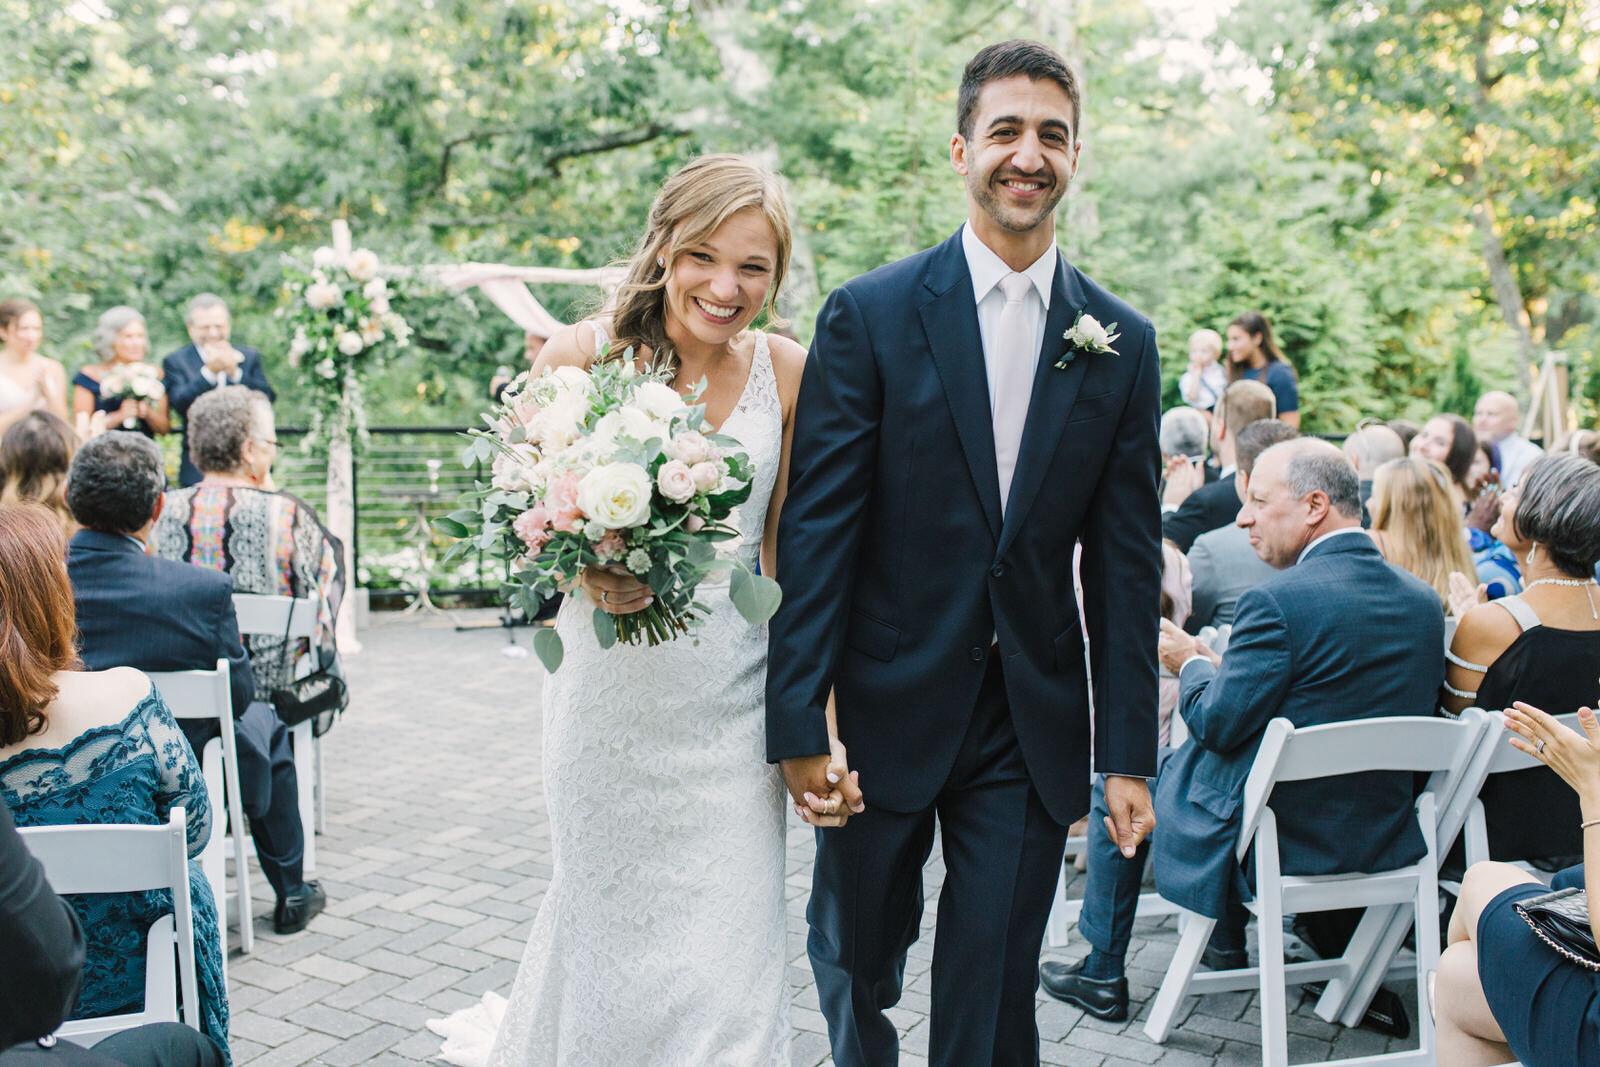 lakeview-pavillion-photographer-wedding.JPG